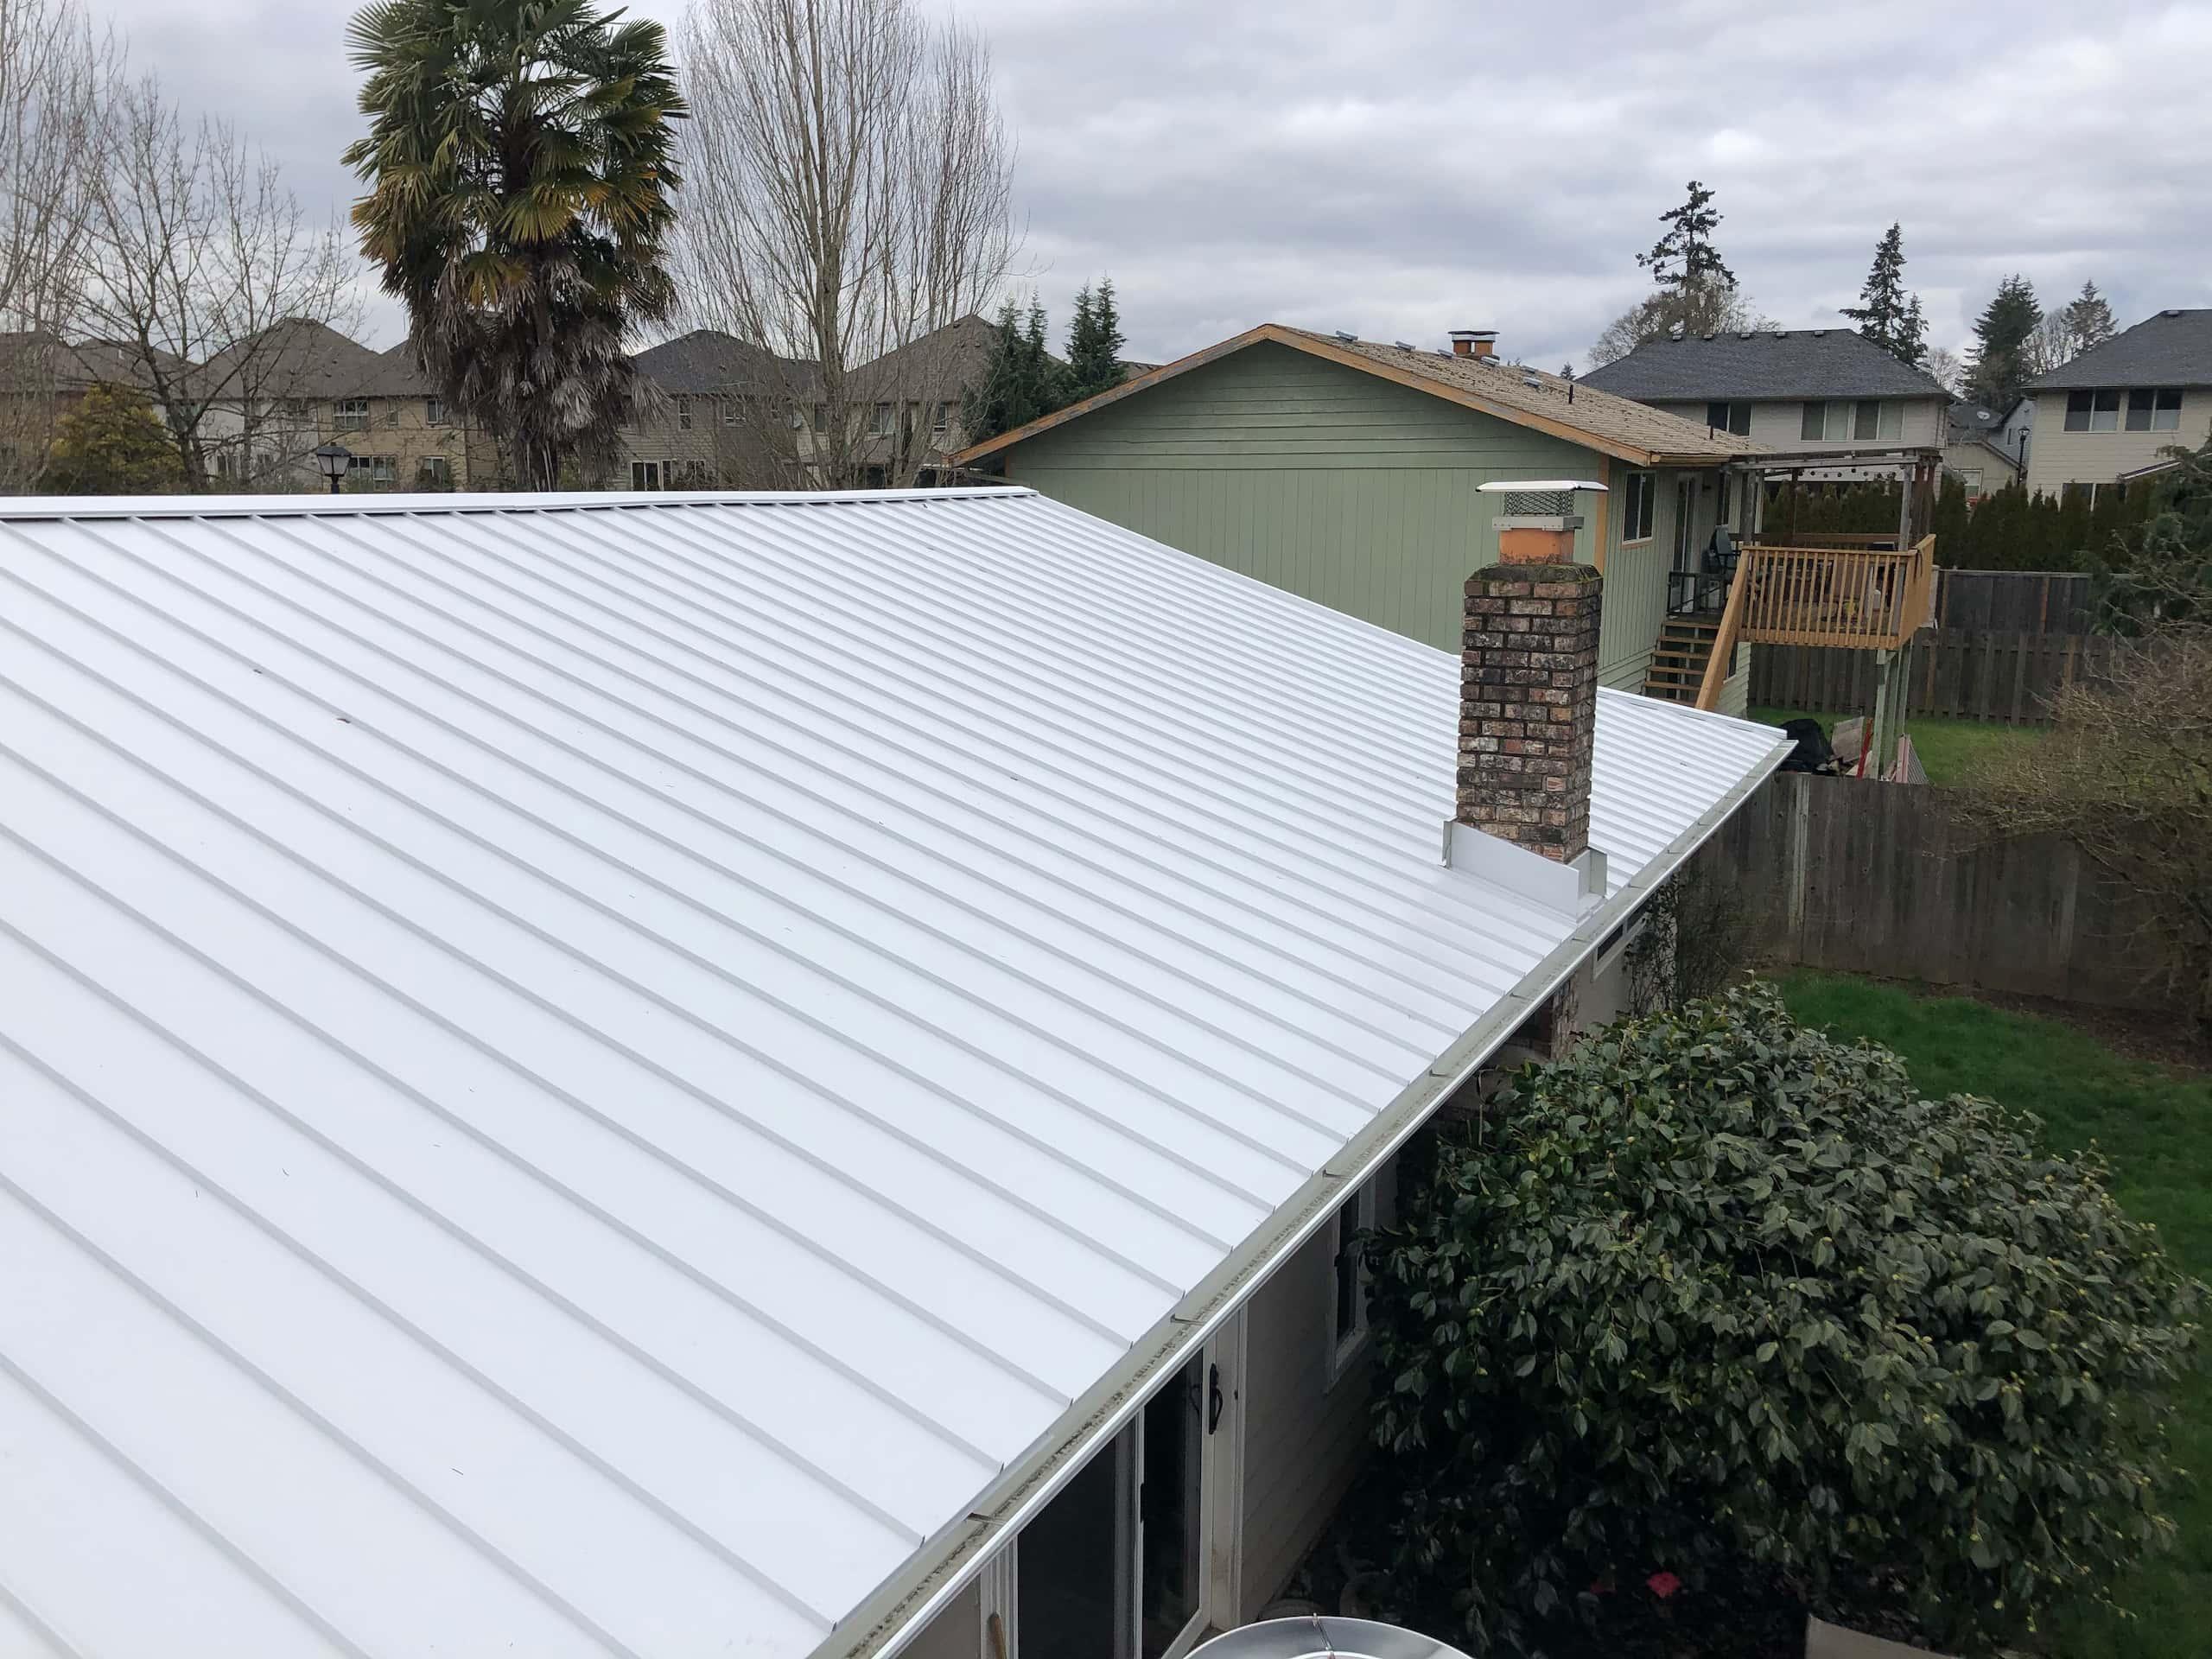 Reliance Roof Pros LLC | Beaverton | New Roof | Taylor Metal 24 Gauge Kynar | Glacier White | Chimney